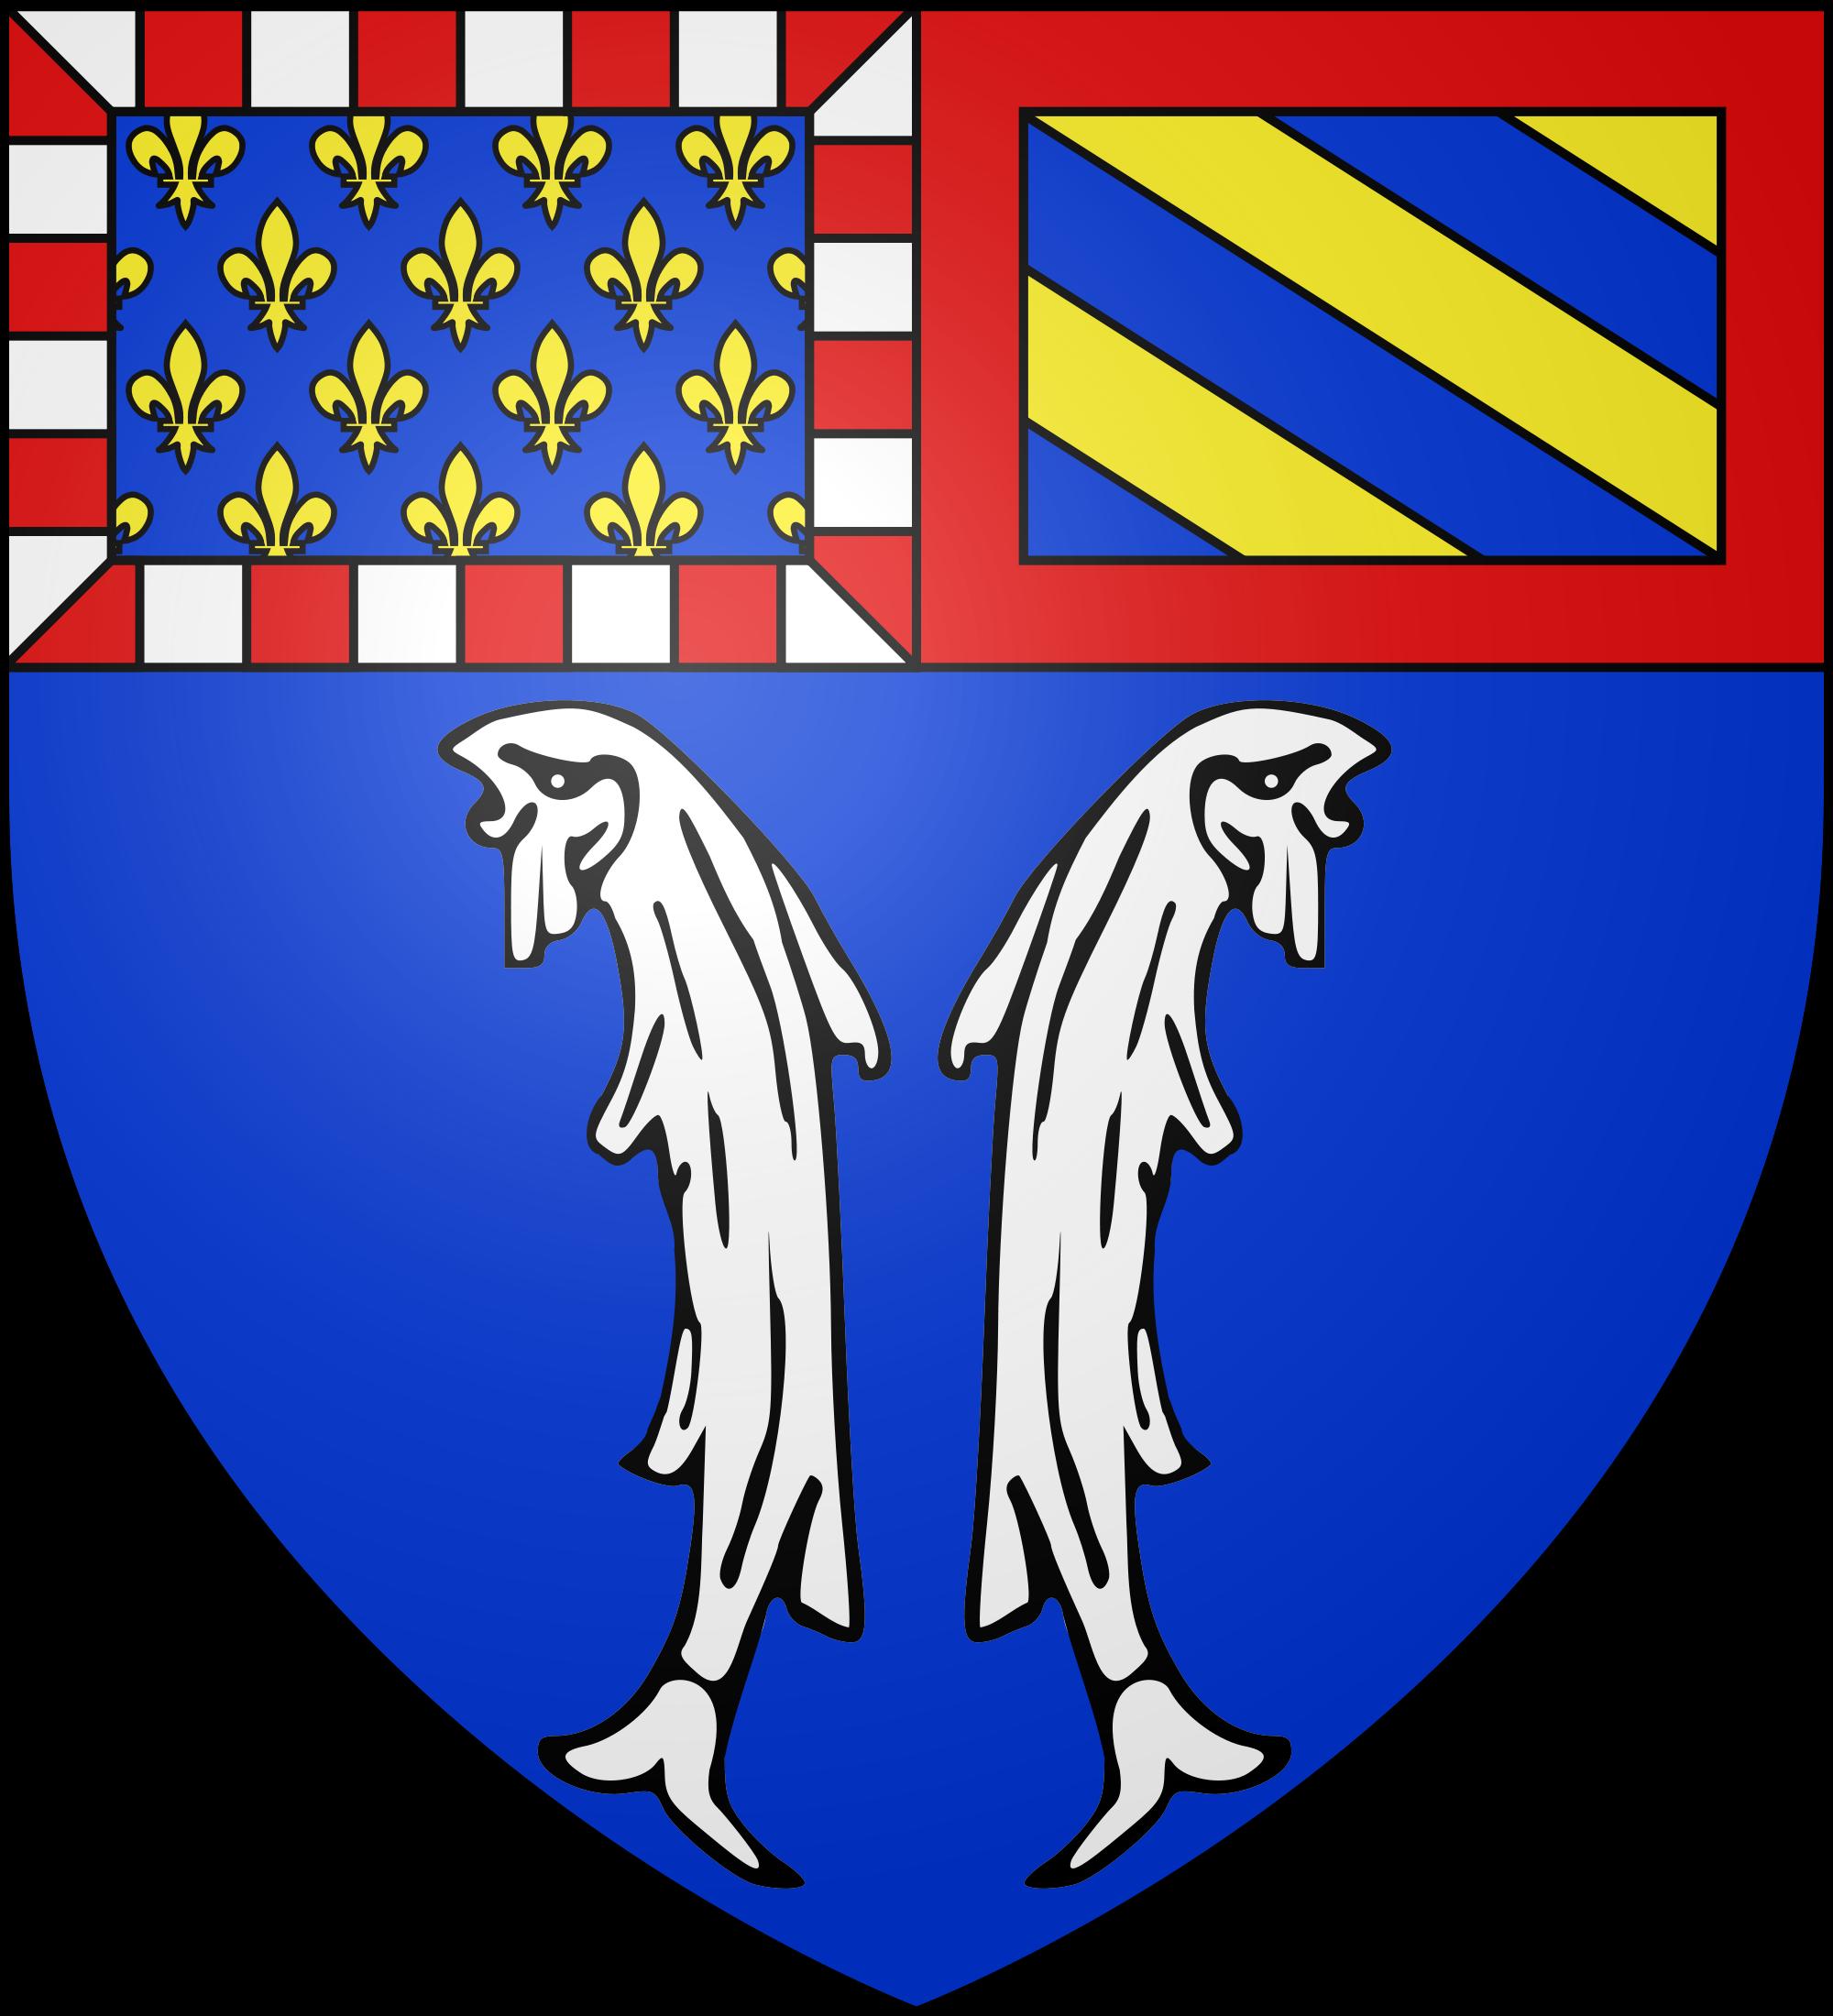 Manteau de Montbard